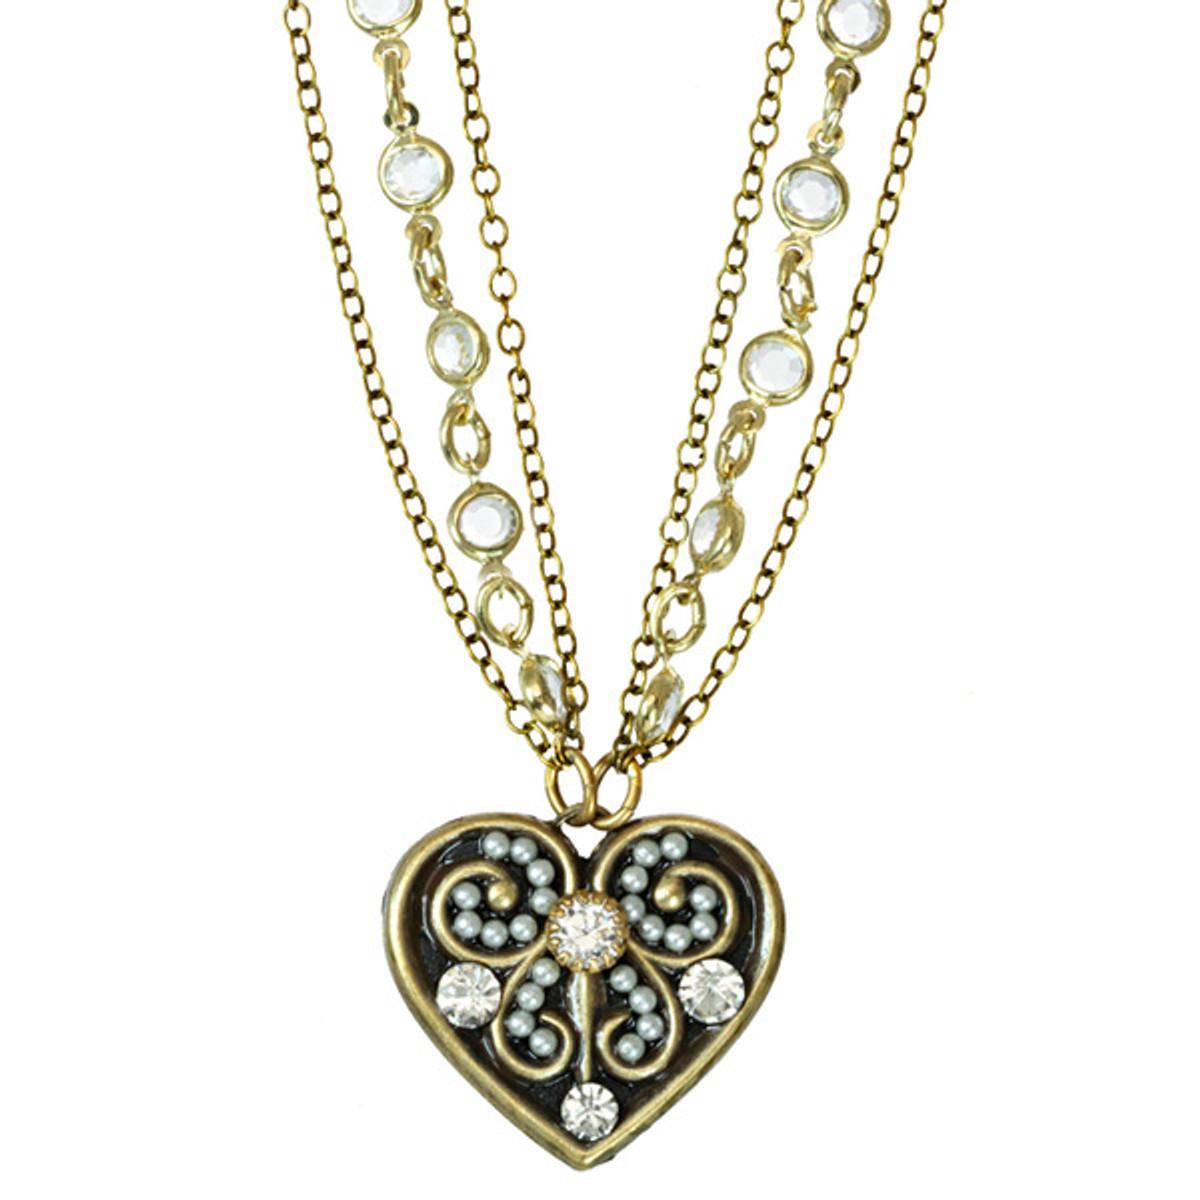 Michal Golan Small Heart Pendant On Chanel